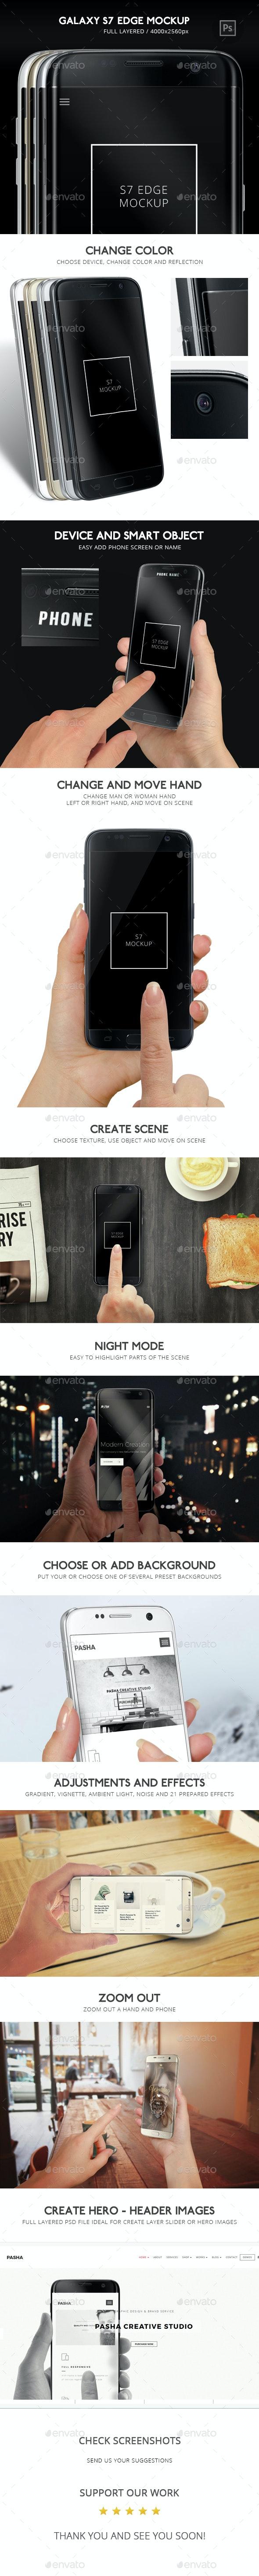 Galaxy S7 Edge Mockup - Mobile Displays